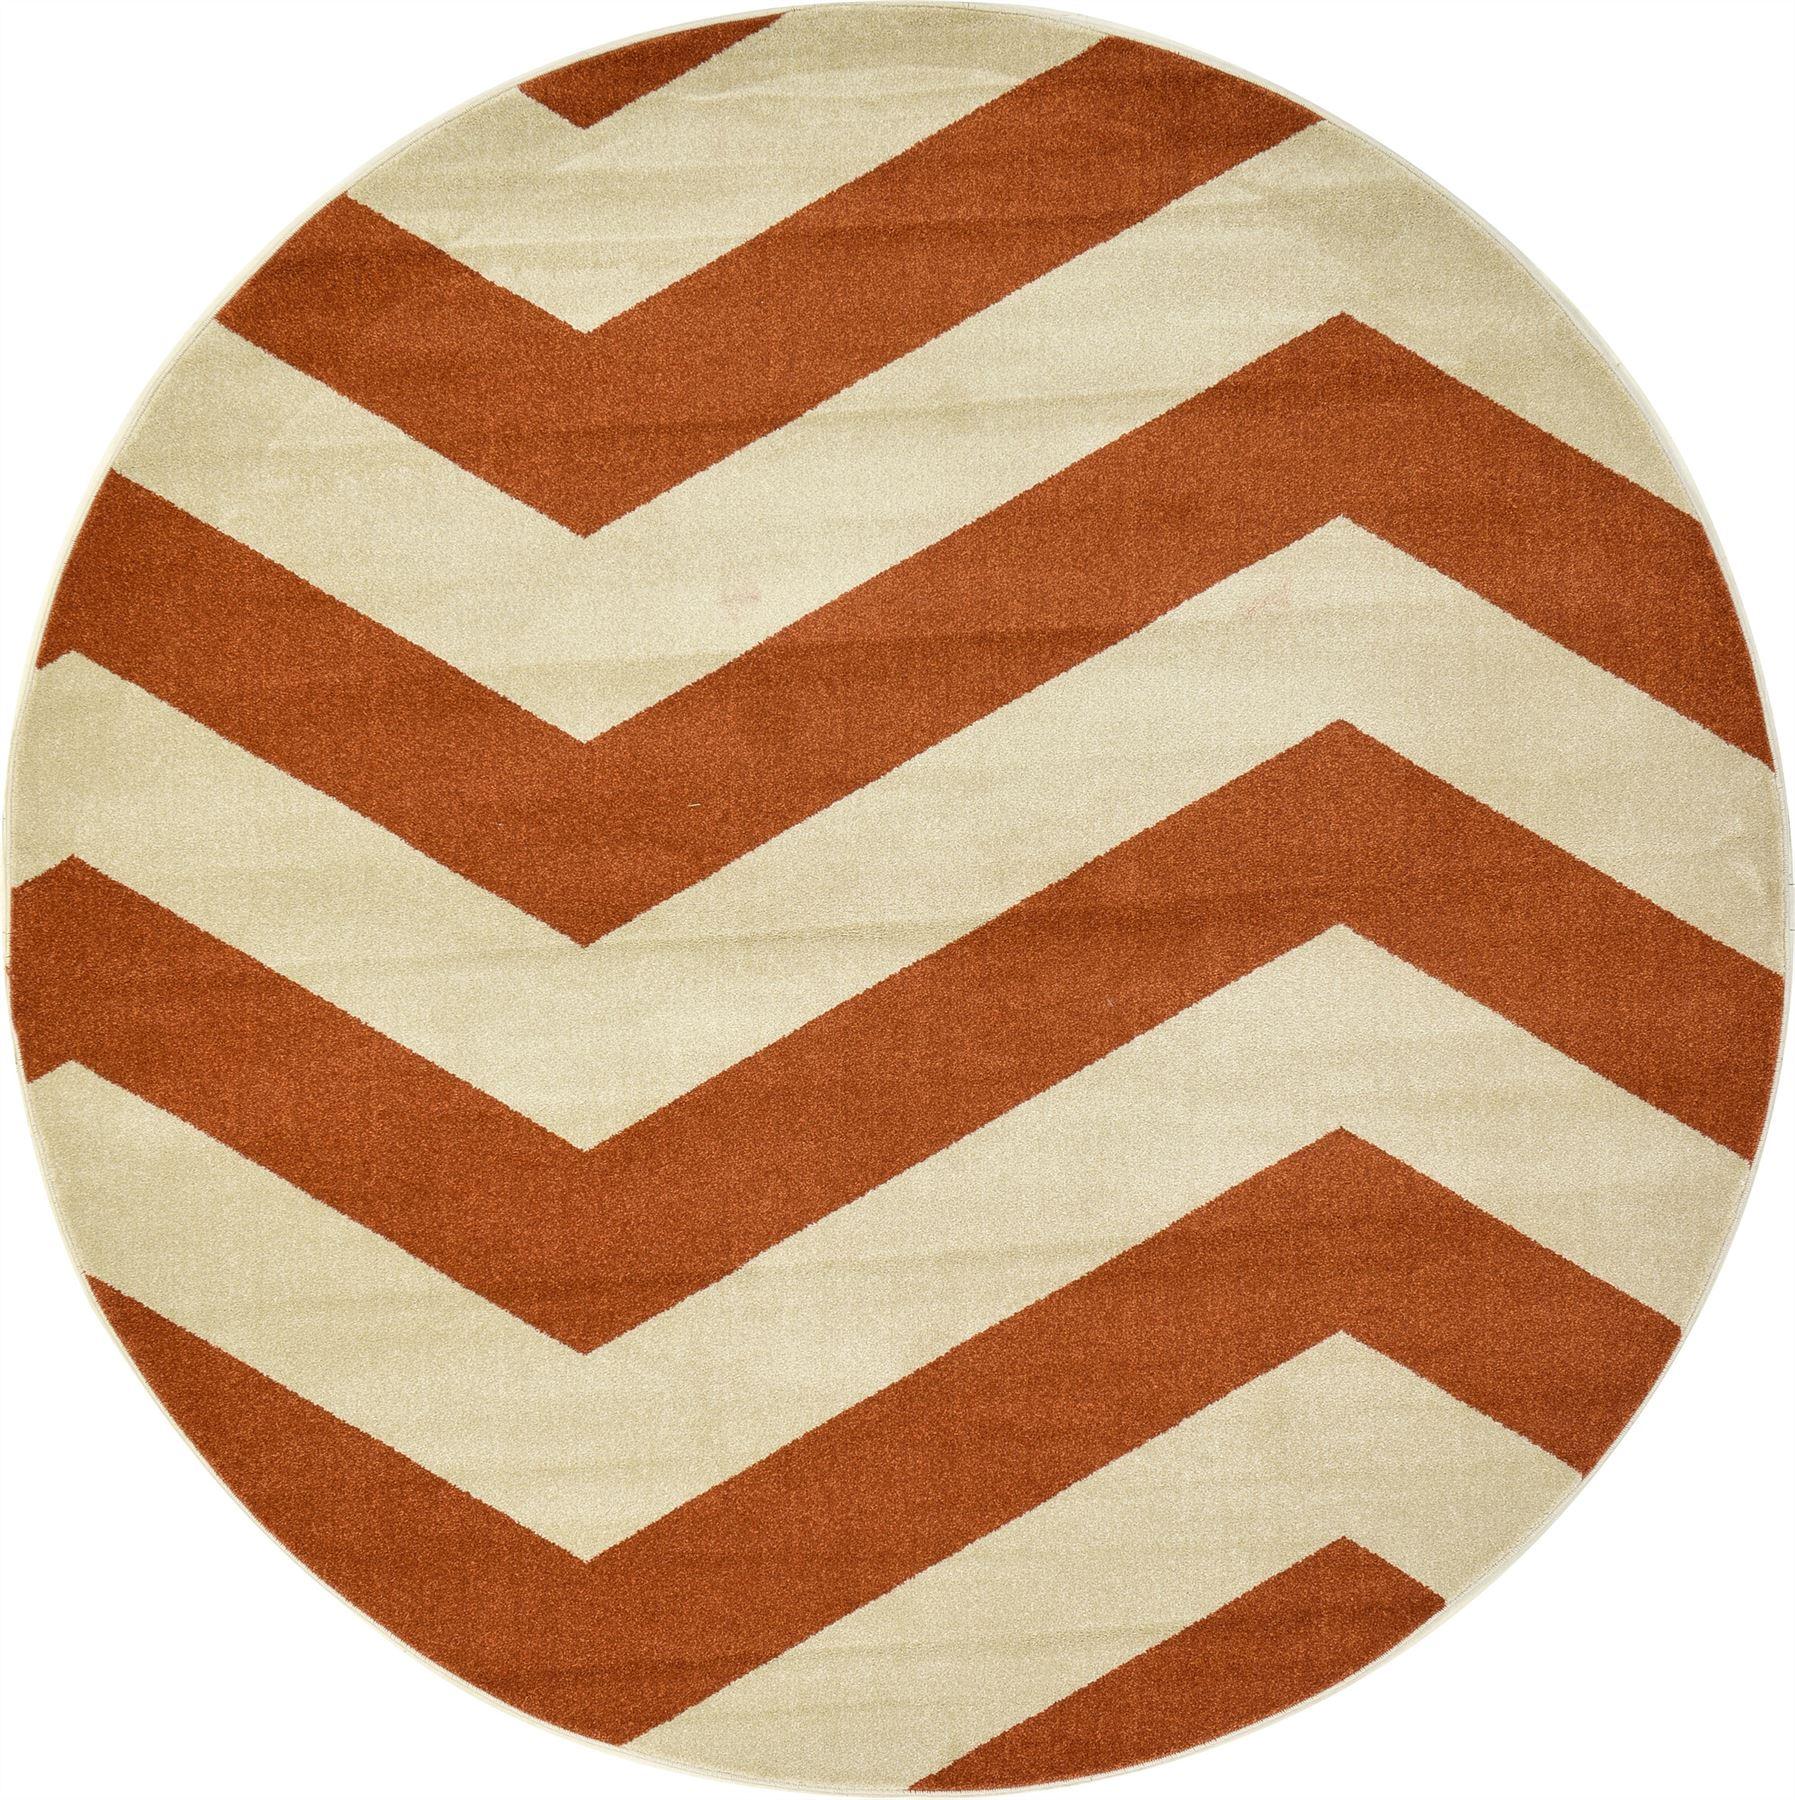 contemporary carpets rug modern chevron design rugs and carpet  - contemporarycarpetsrugmodernchevrondesignrugsand